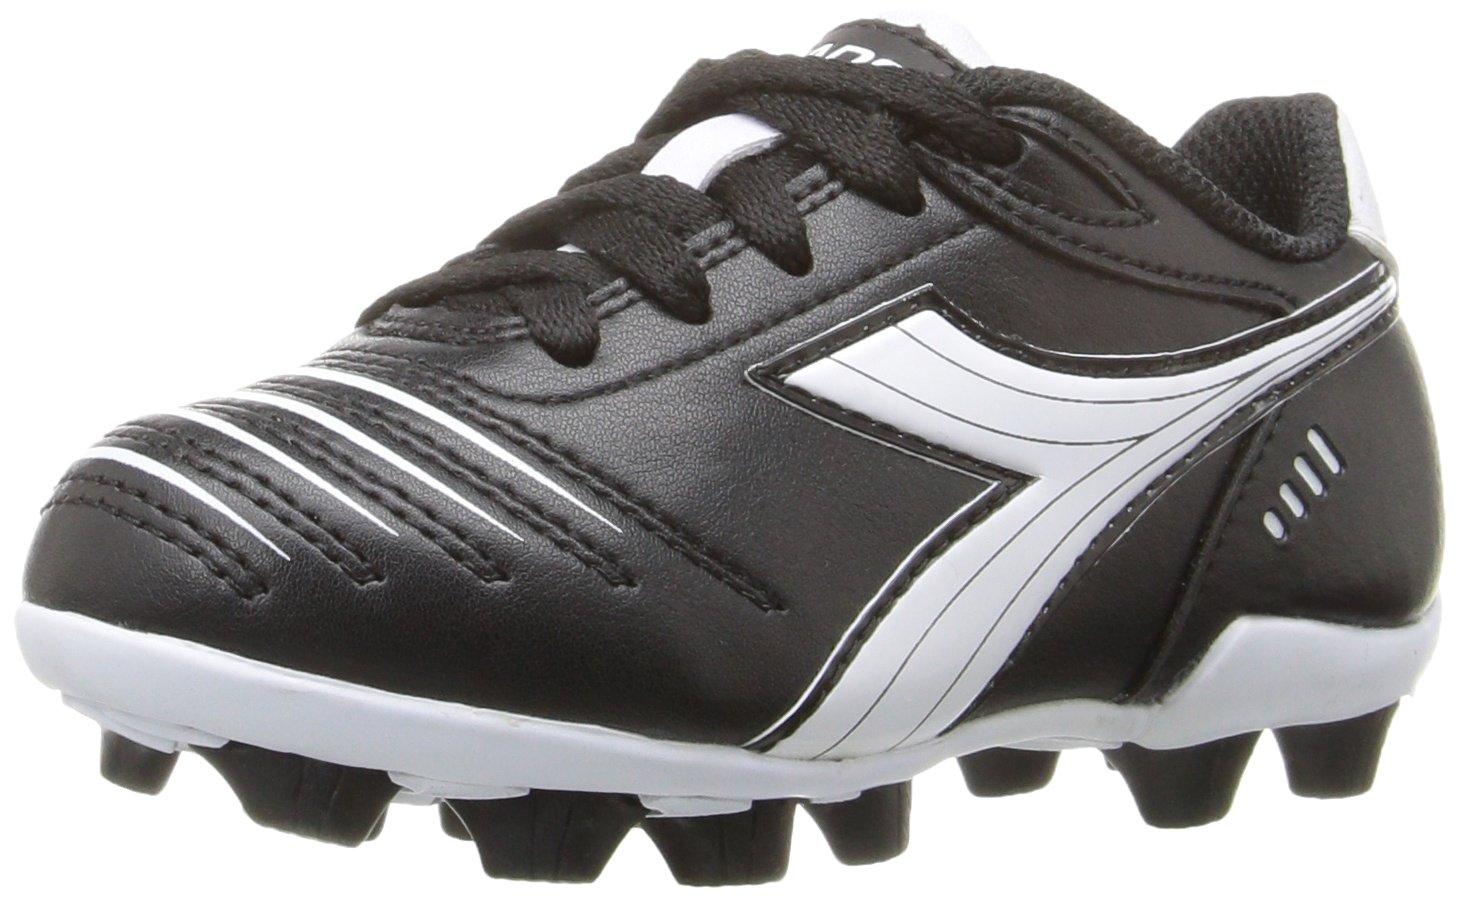 Diadora Kids' Cattura MD Jr Soccer Shoe, Black/White, 11 M US Little Kid